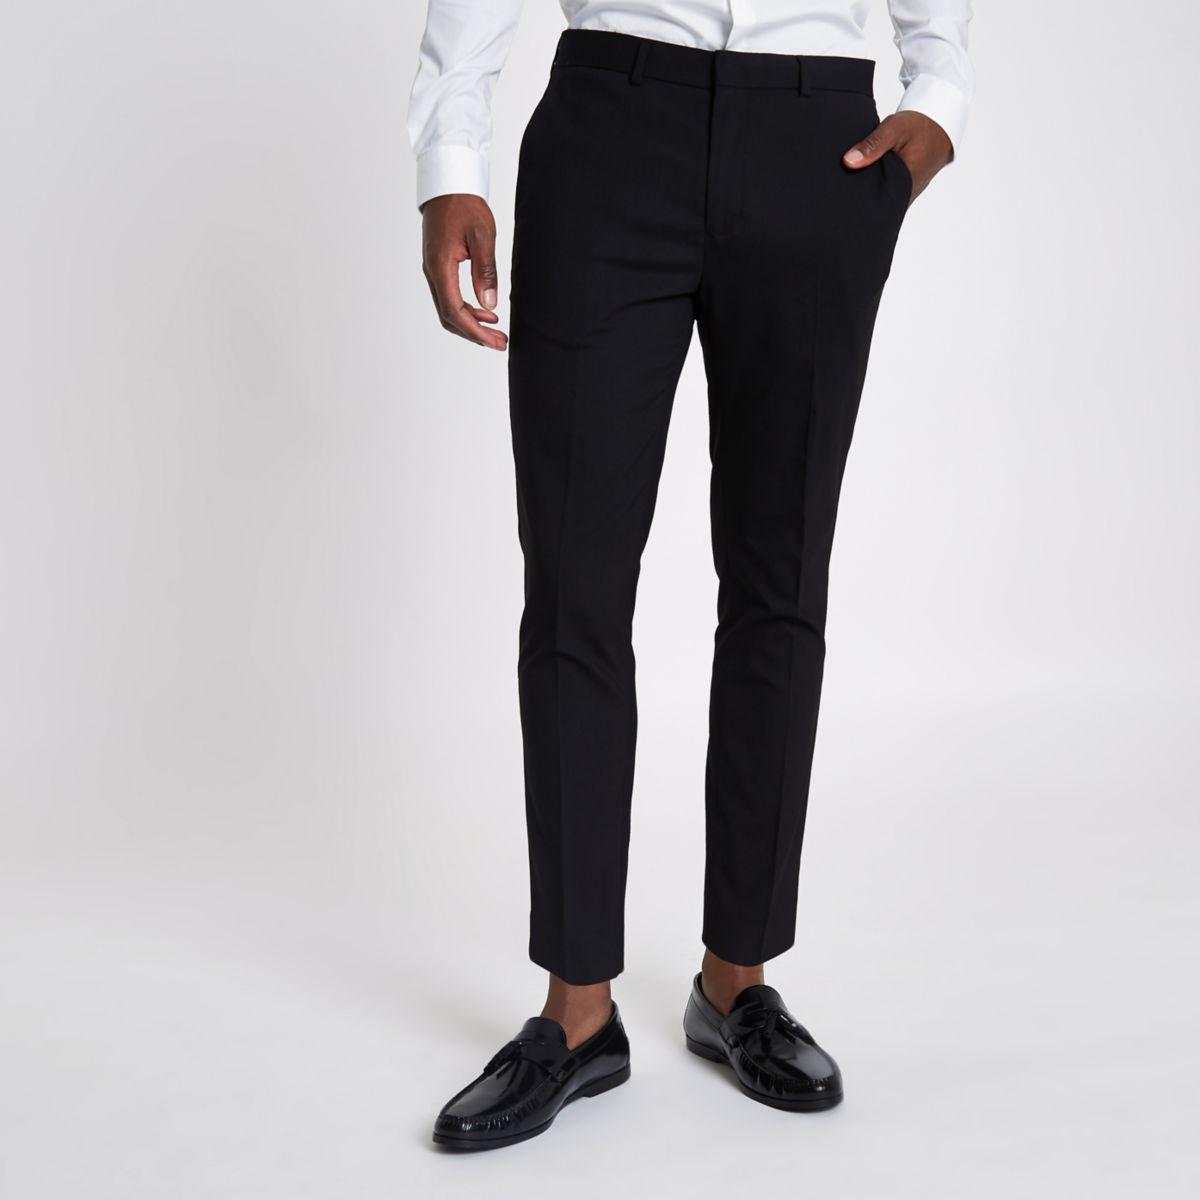 Black skinny cropped smart pants